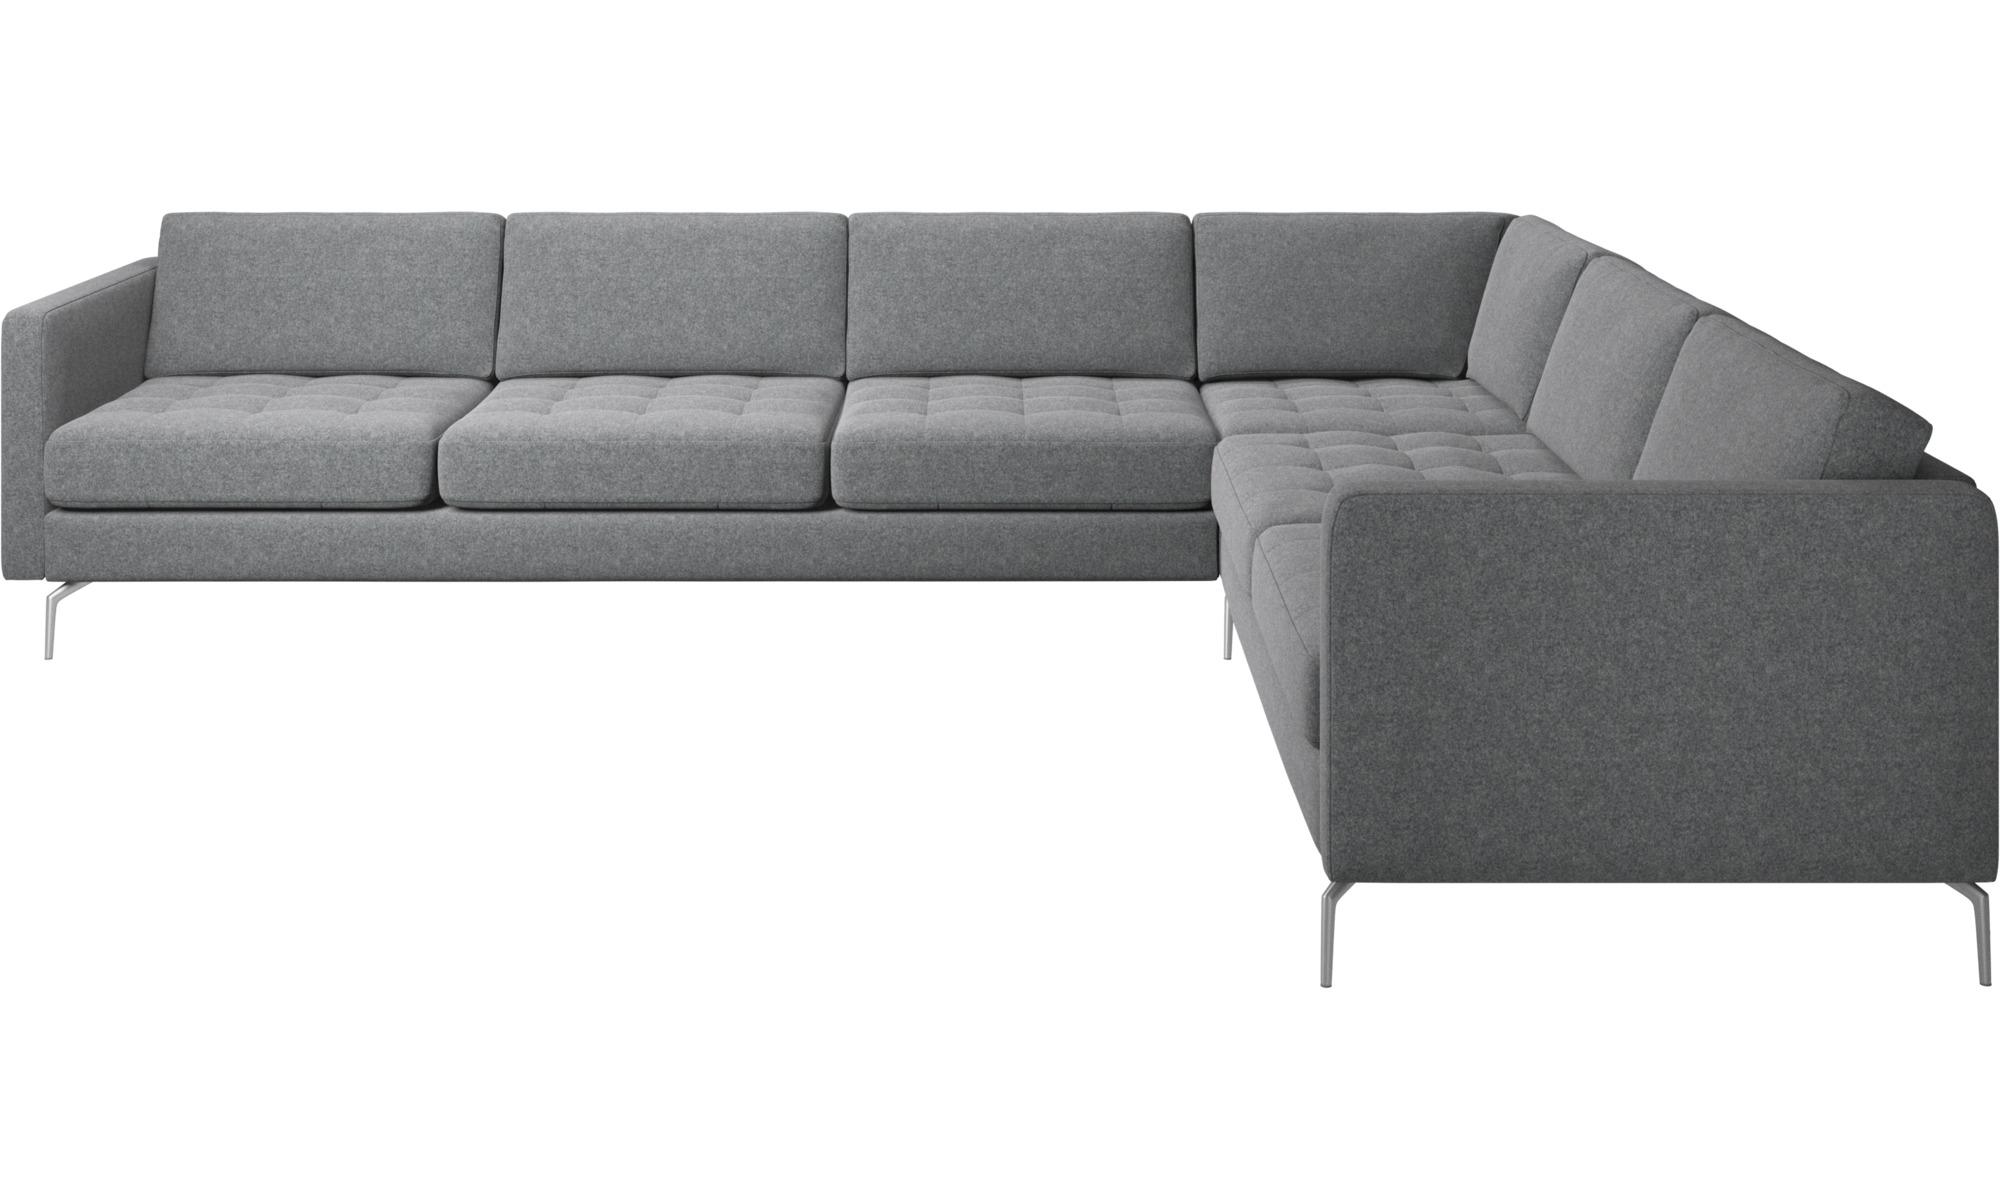 canap s d 39 angle canap d 39 angle osaka assise capitonn e. Black Bedroom Furniture Sets. Home Design Ideas